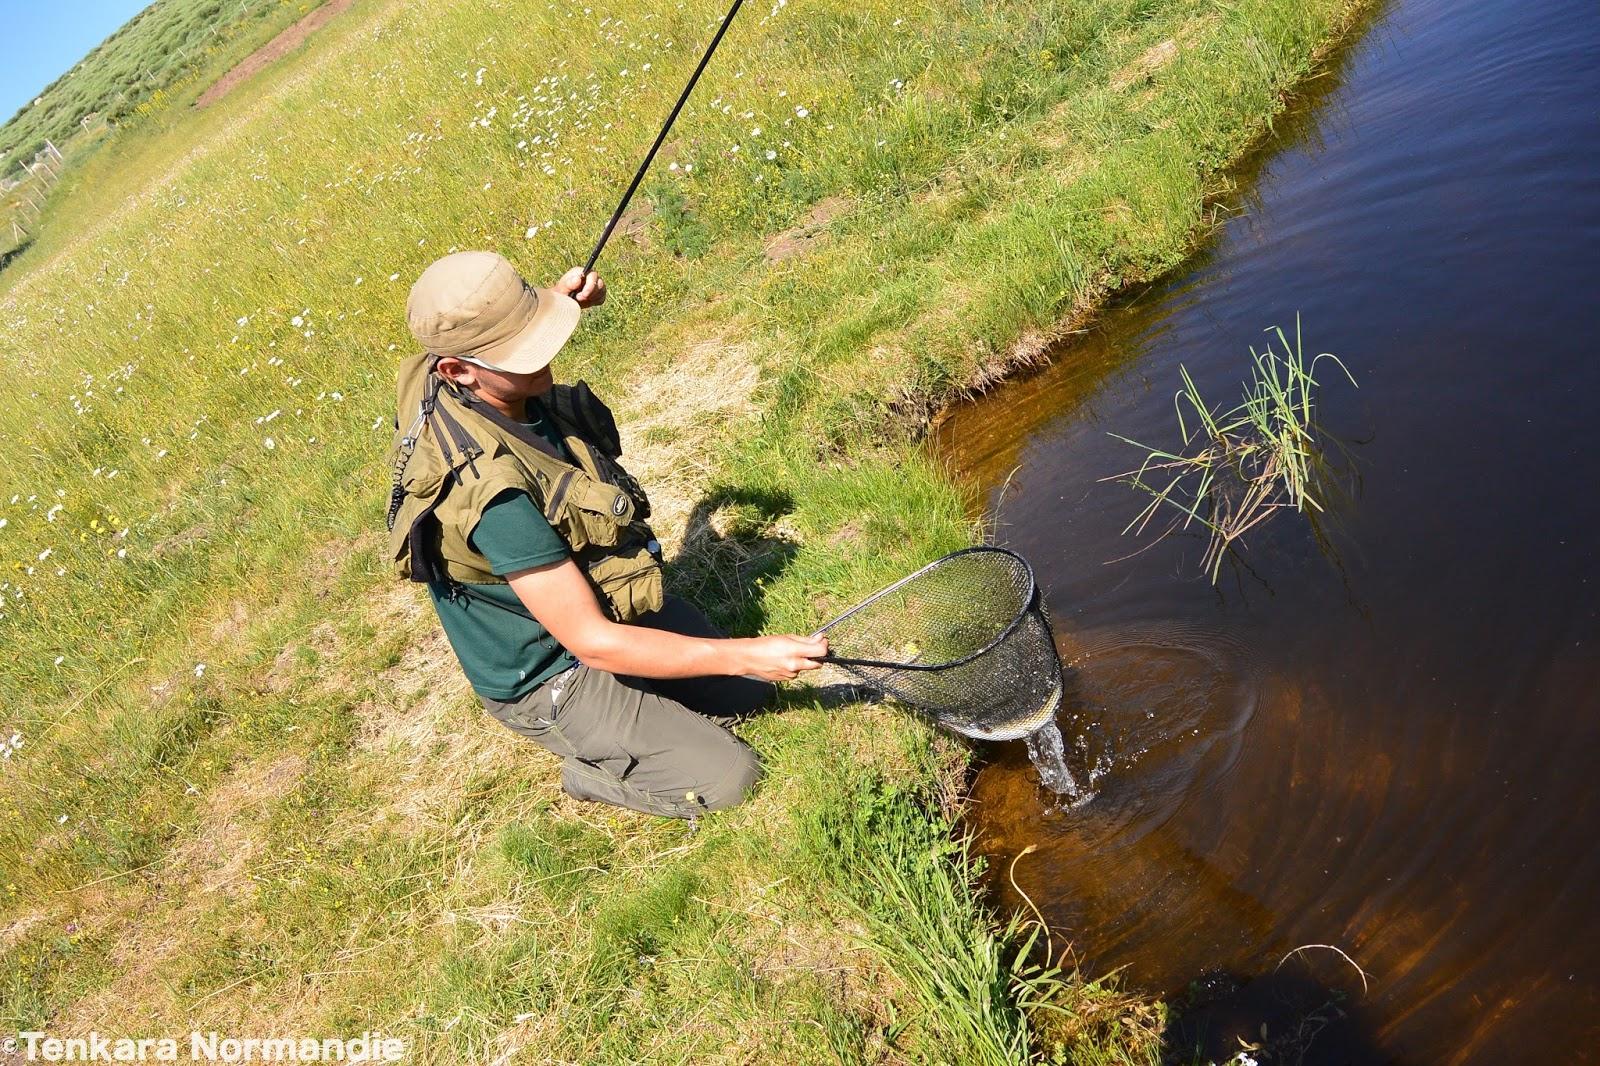 Les bases de la banlieue de Moscou du repos avec la pêche à